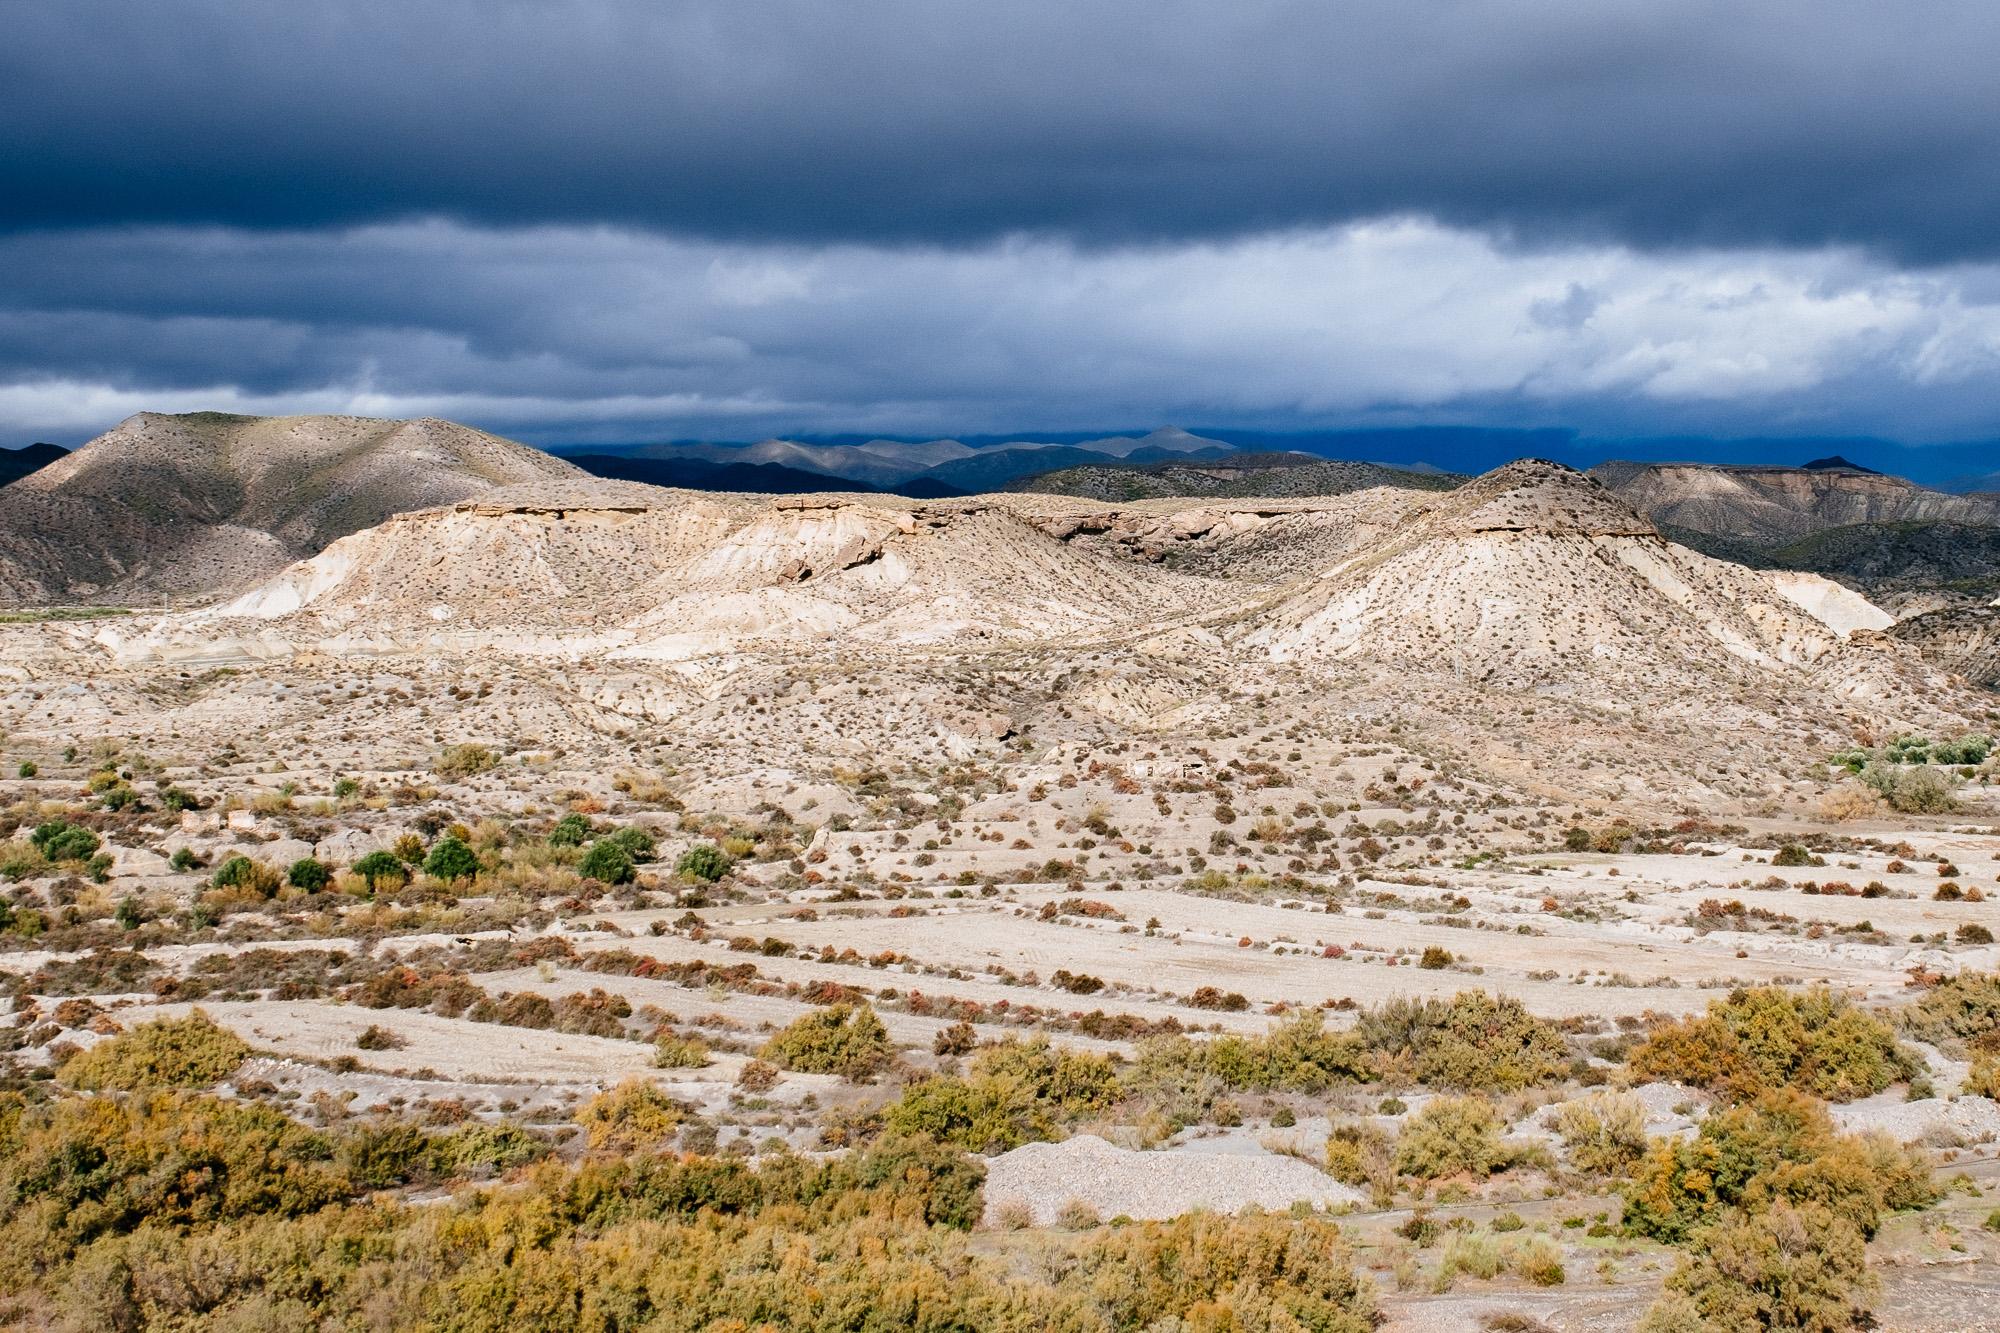 Fort Bravo Mountains, Spain